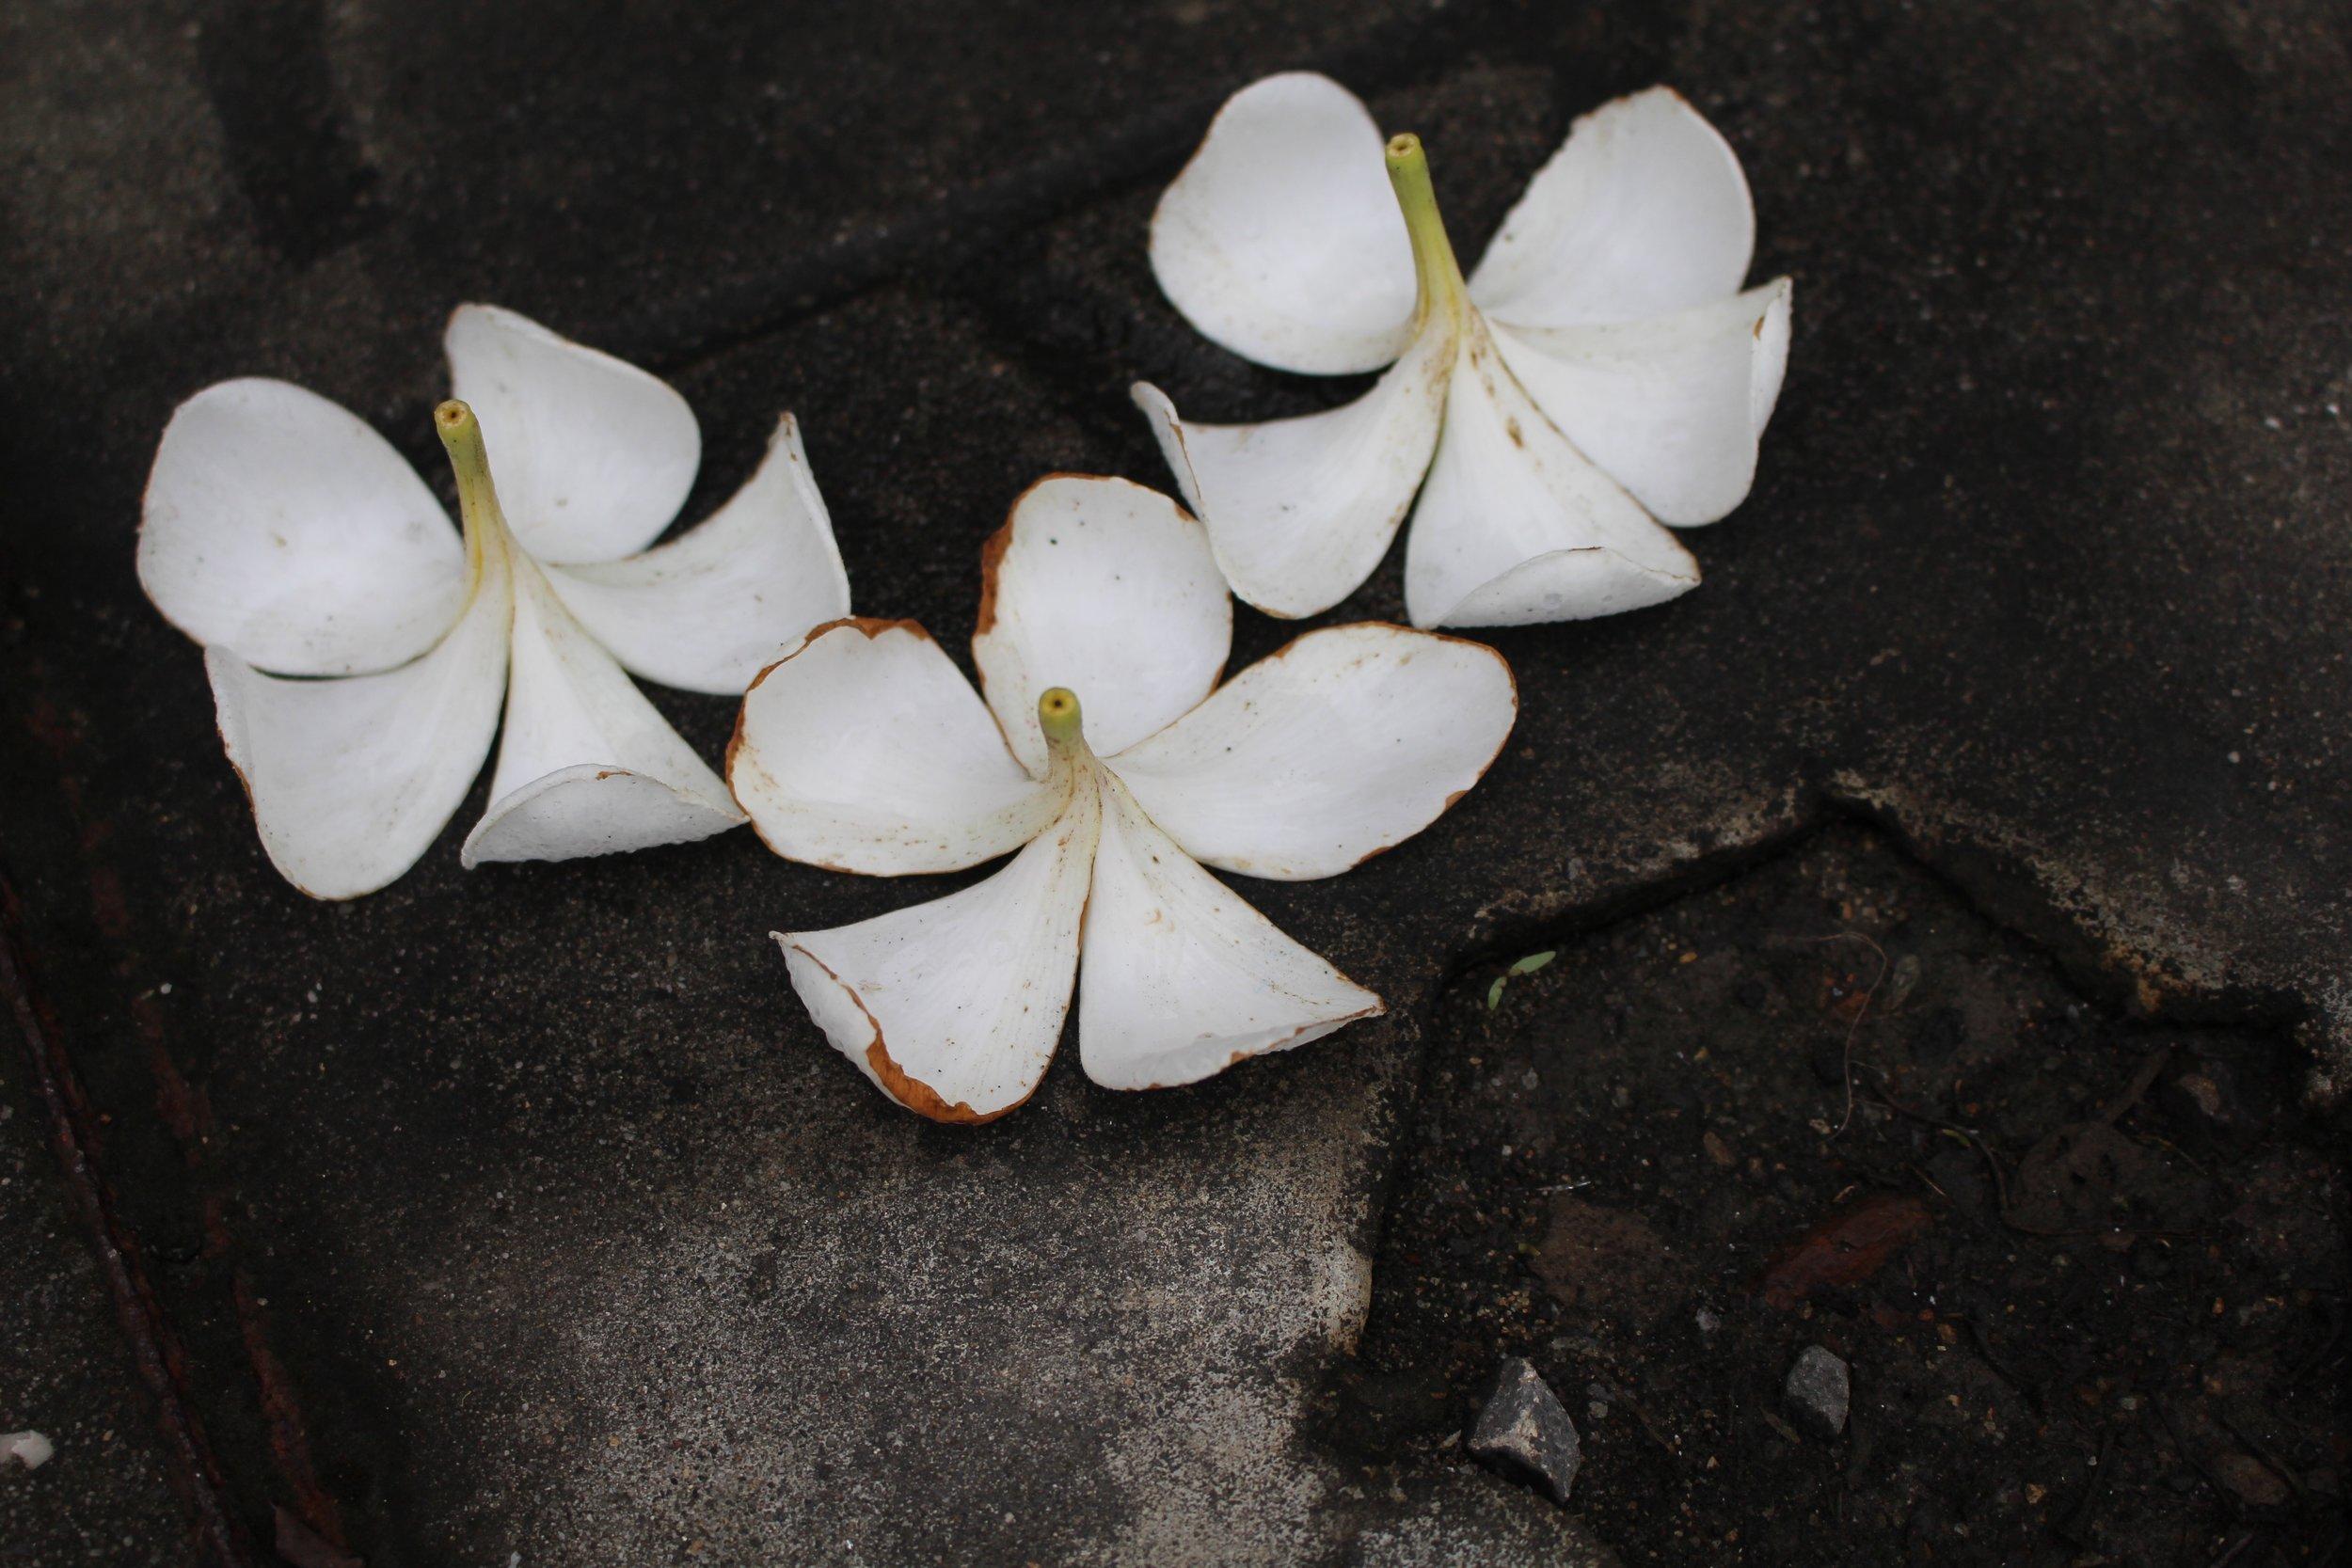 Flower pedals on the sidewalk in Udaipur